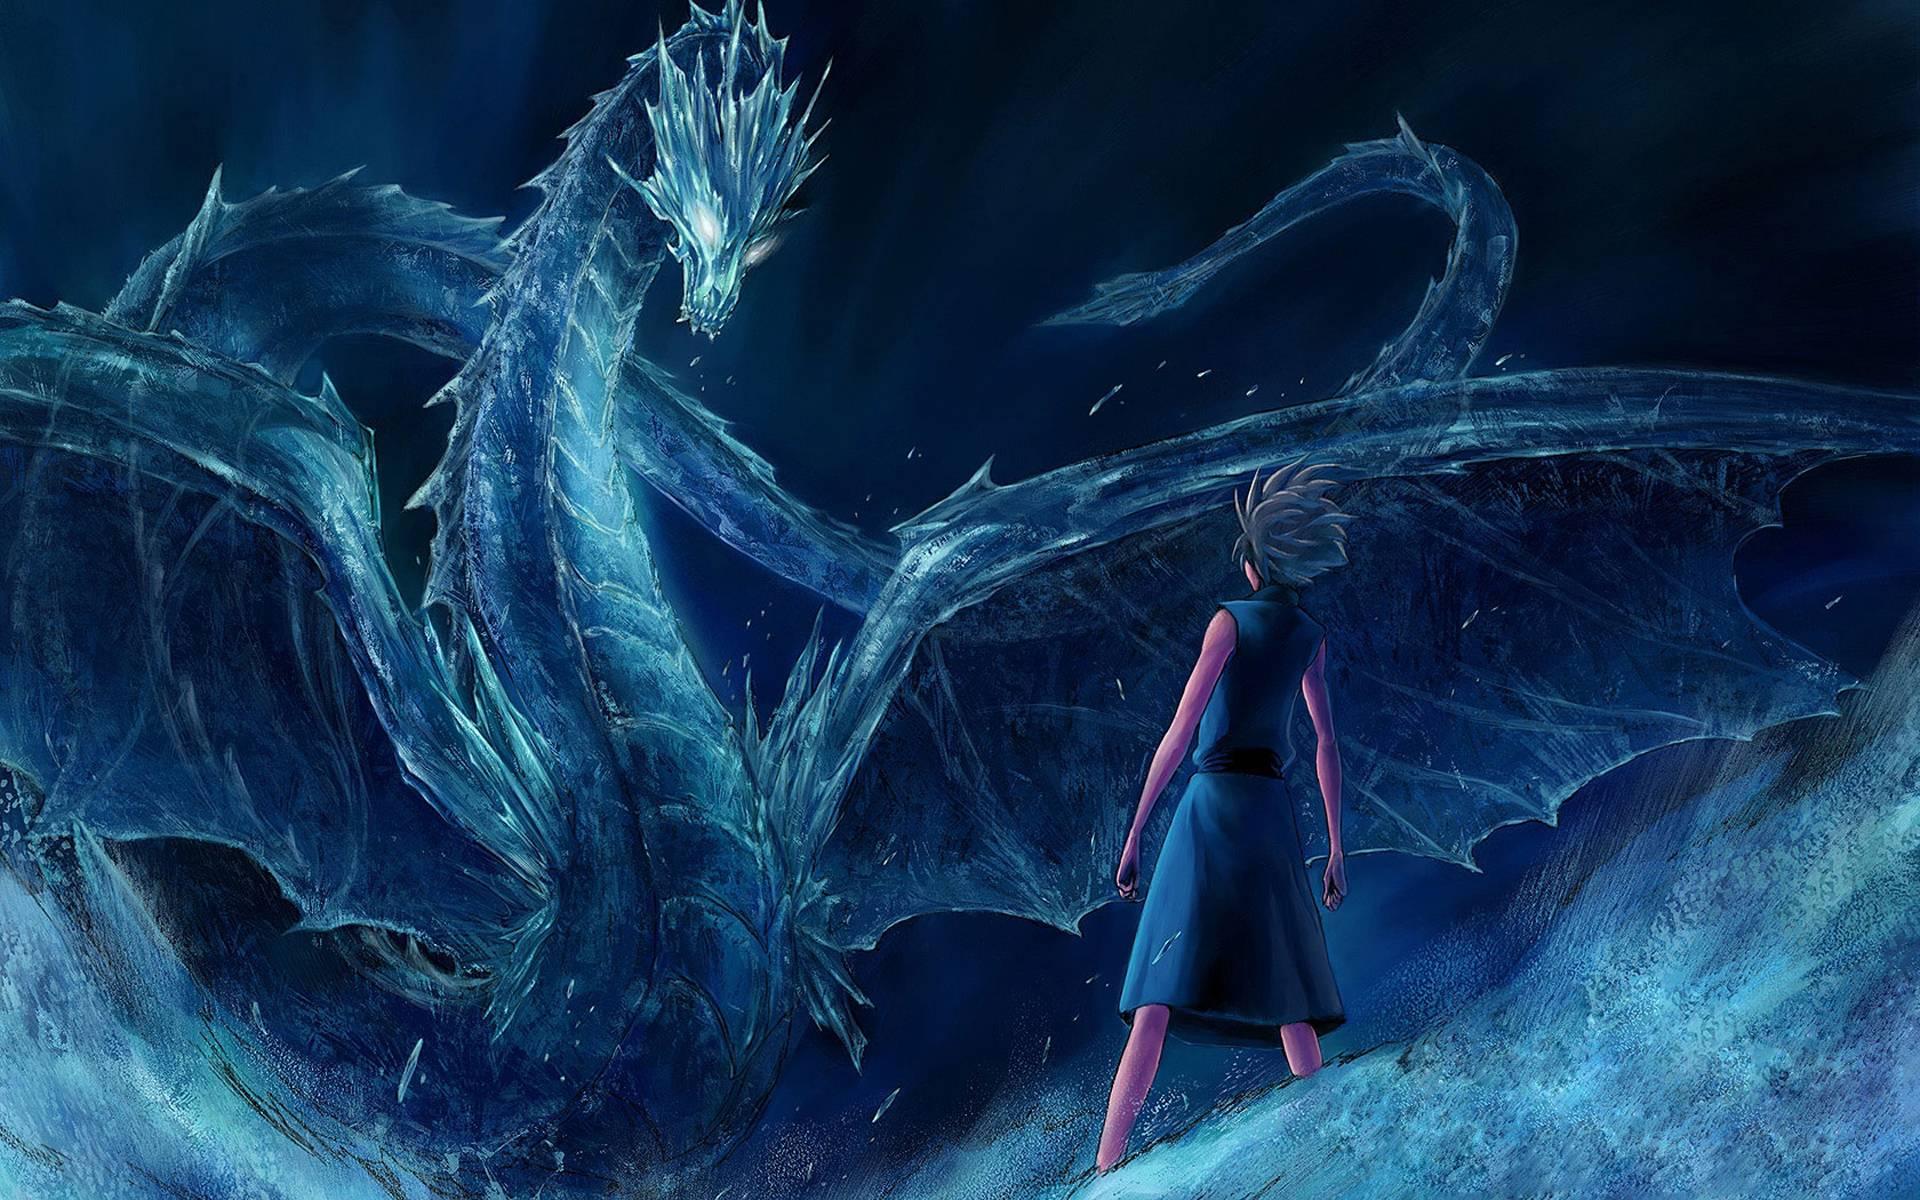 Anime Dragon Wallpapers - Wallpaper Cave